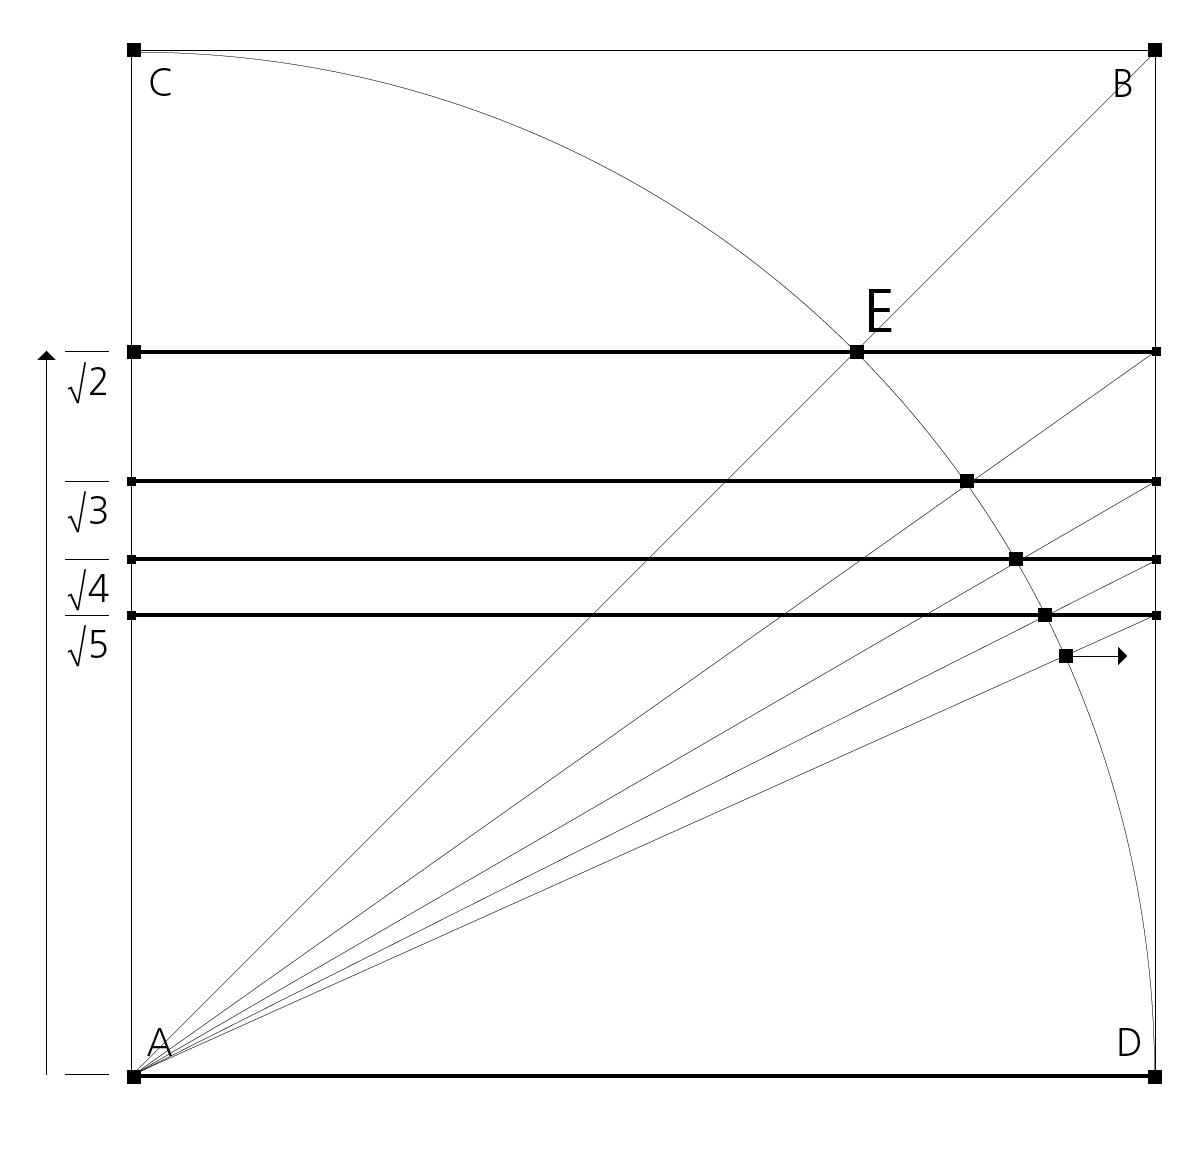 Wurzelzahlen-Folge: Konstruktion im Quadrat